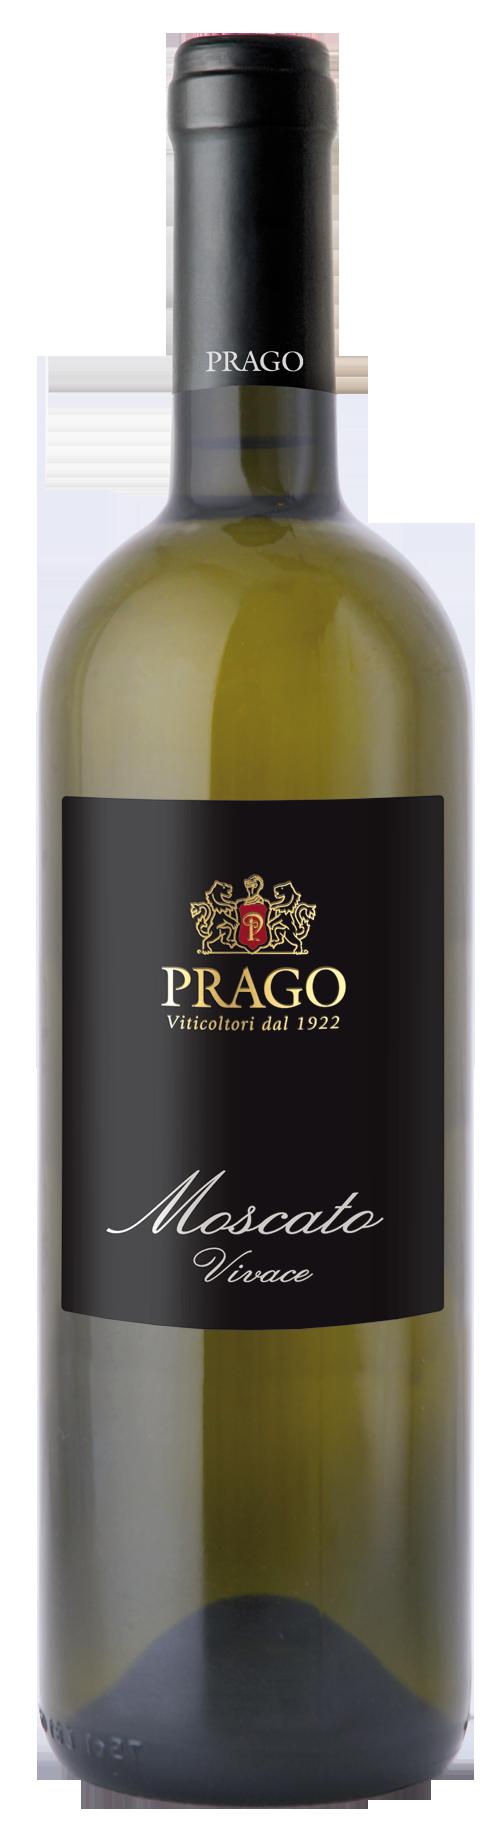 PRAGO Vini e Spumanti Oltrepò Pavese - Vini Vivaci - Moscato